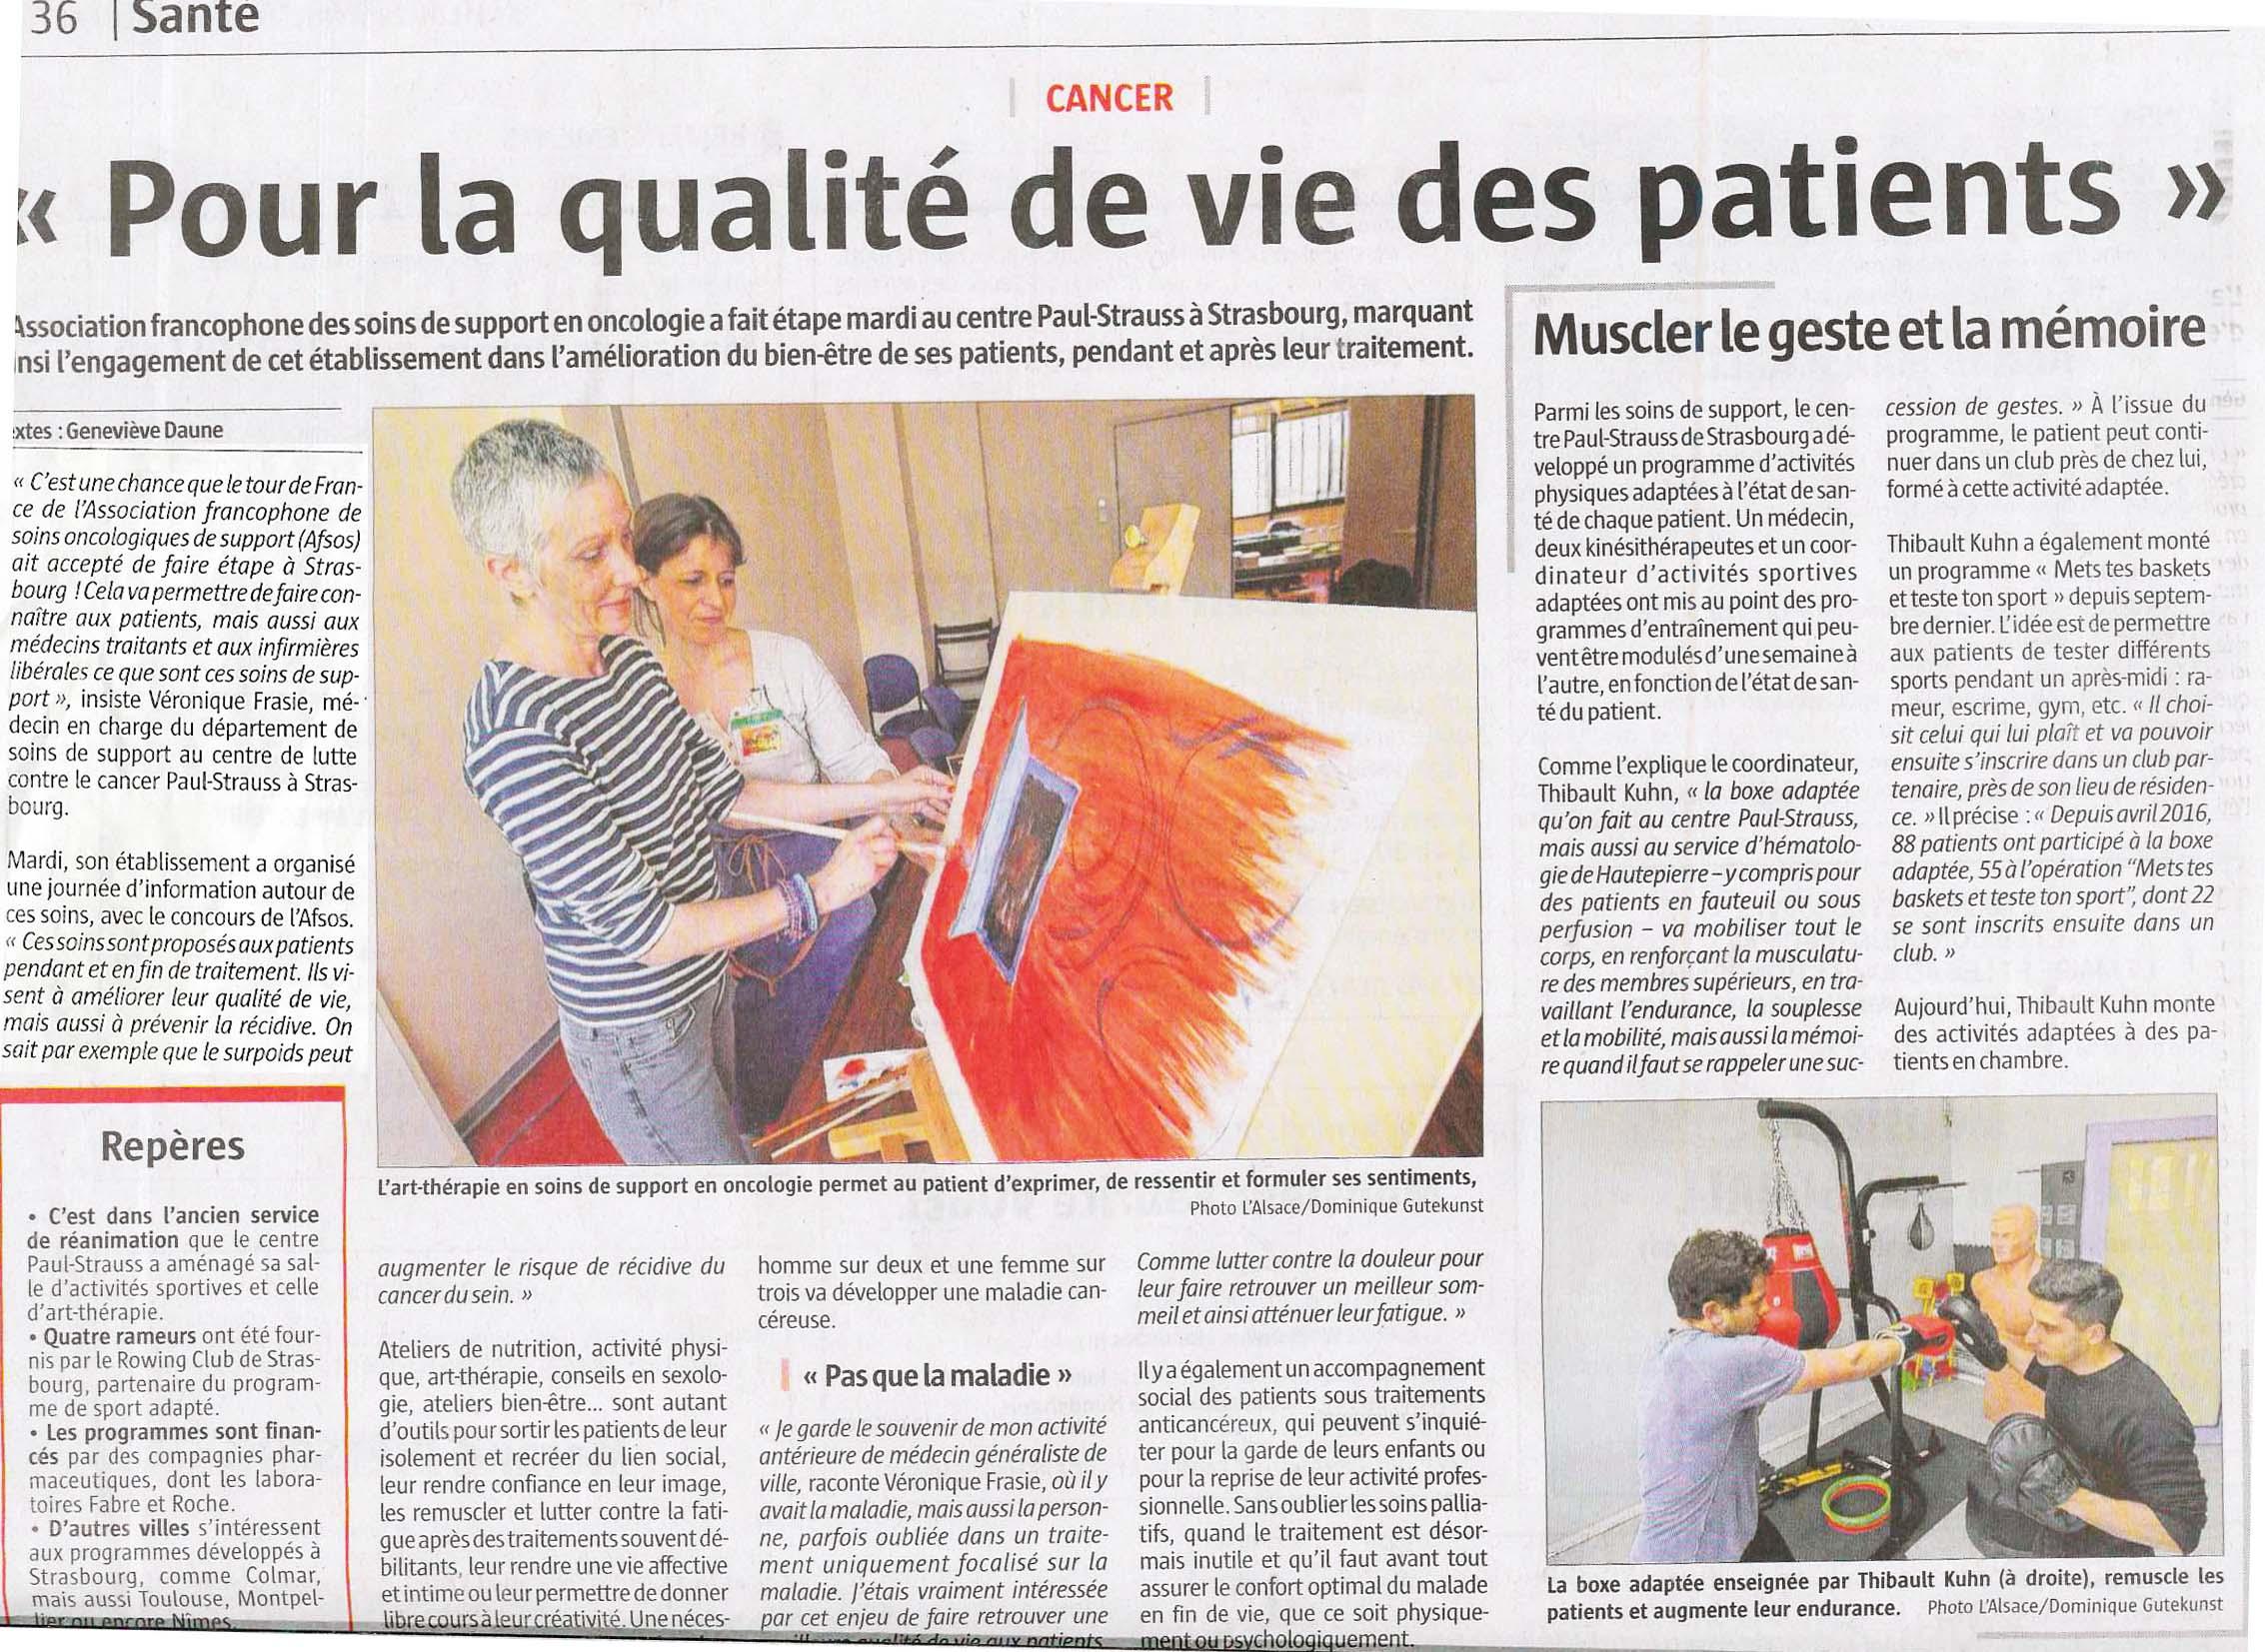 Gissinger-Mariele-Peinture-huile-Peinte-Artiste-Art-gm-Alsace-France